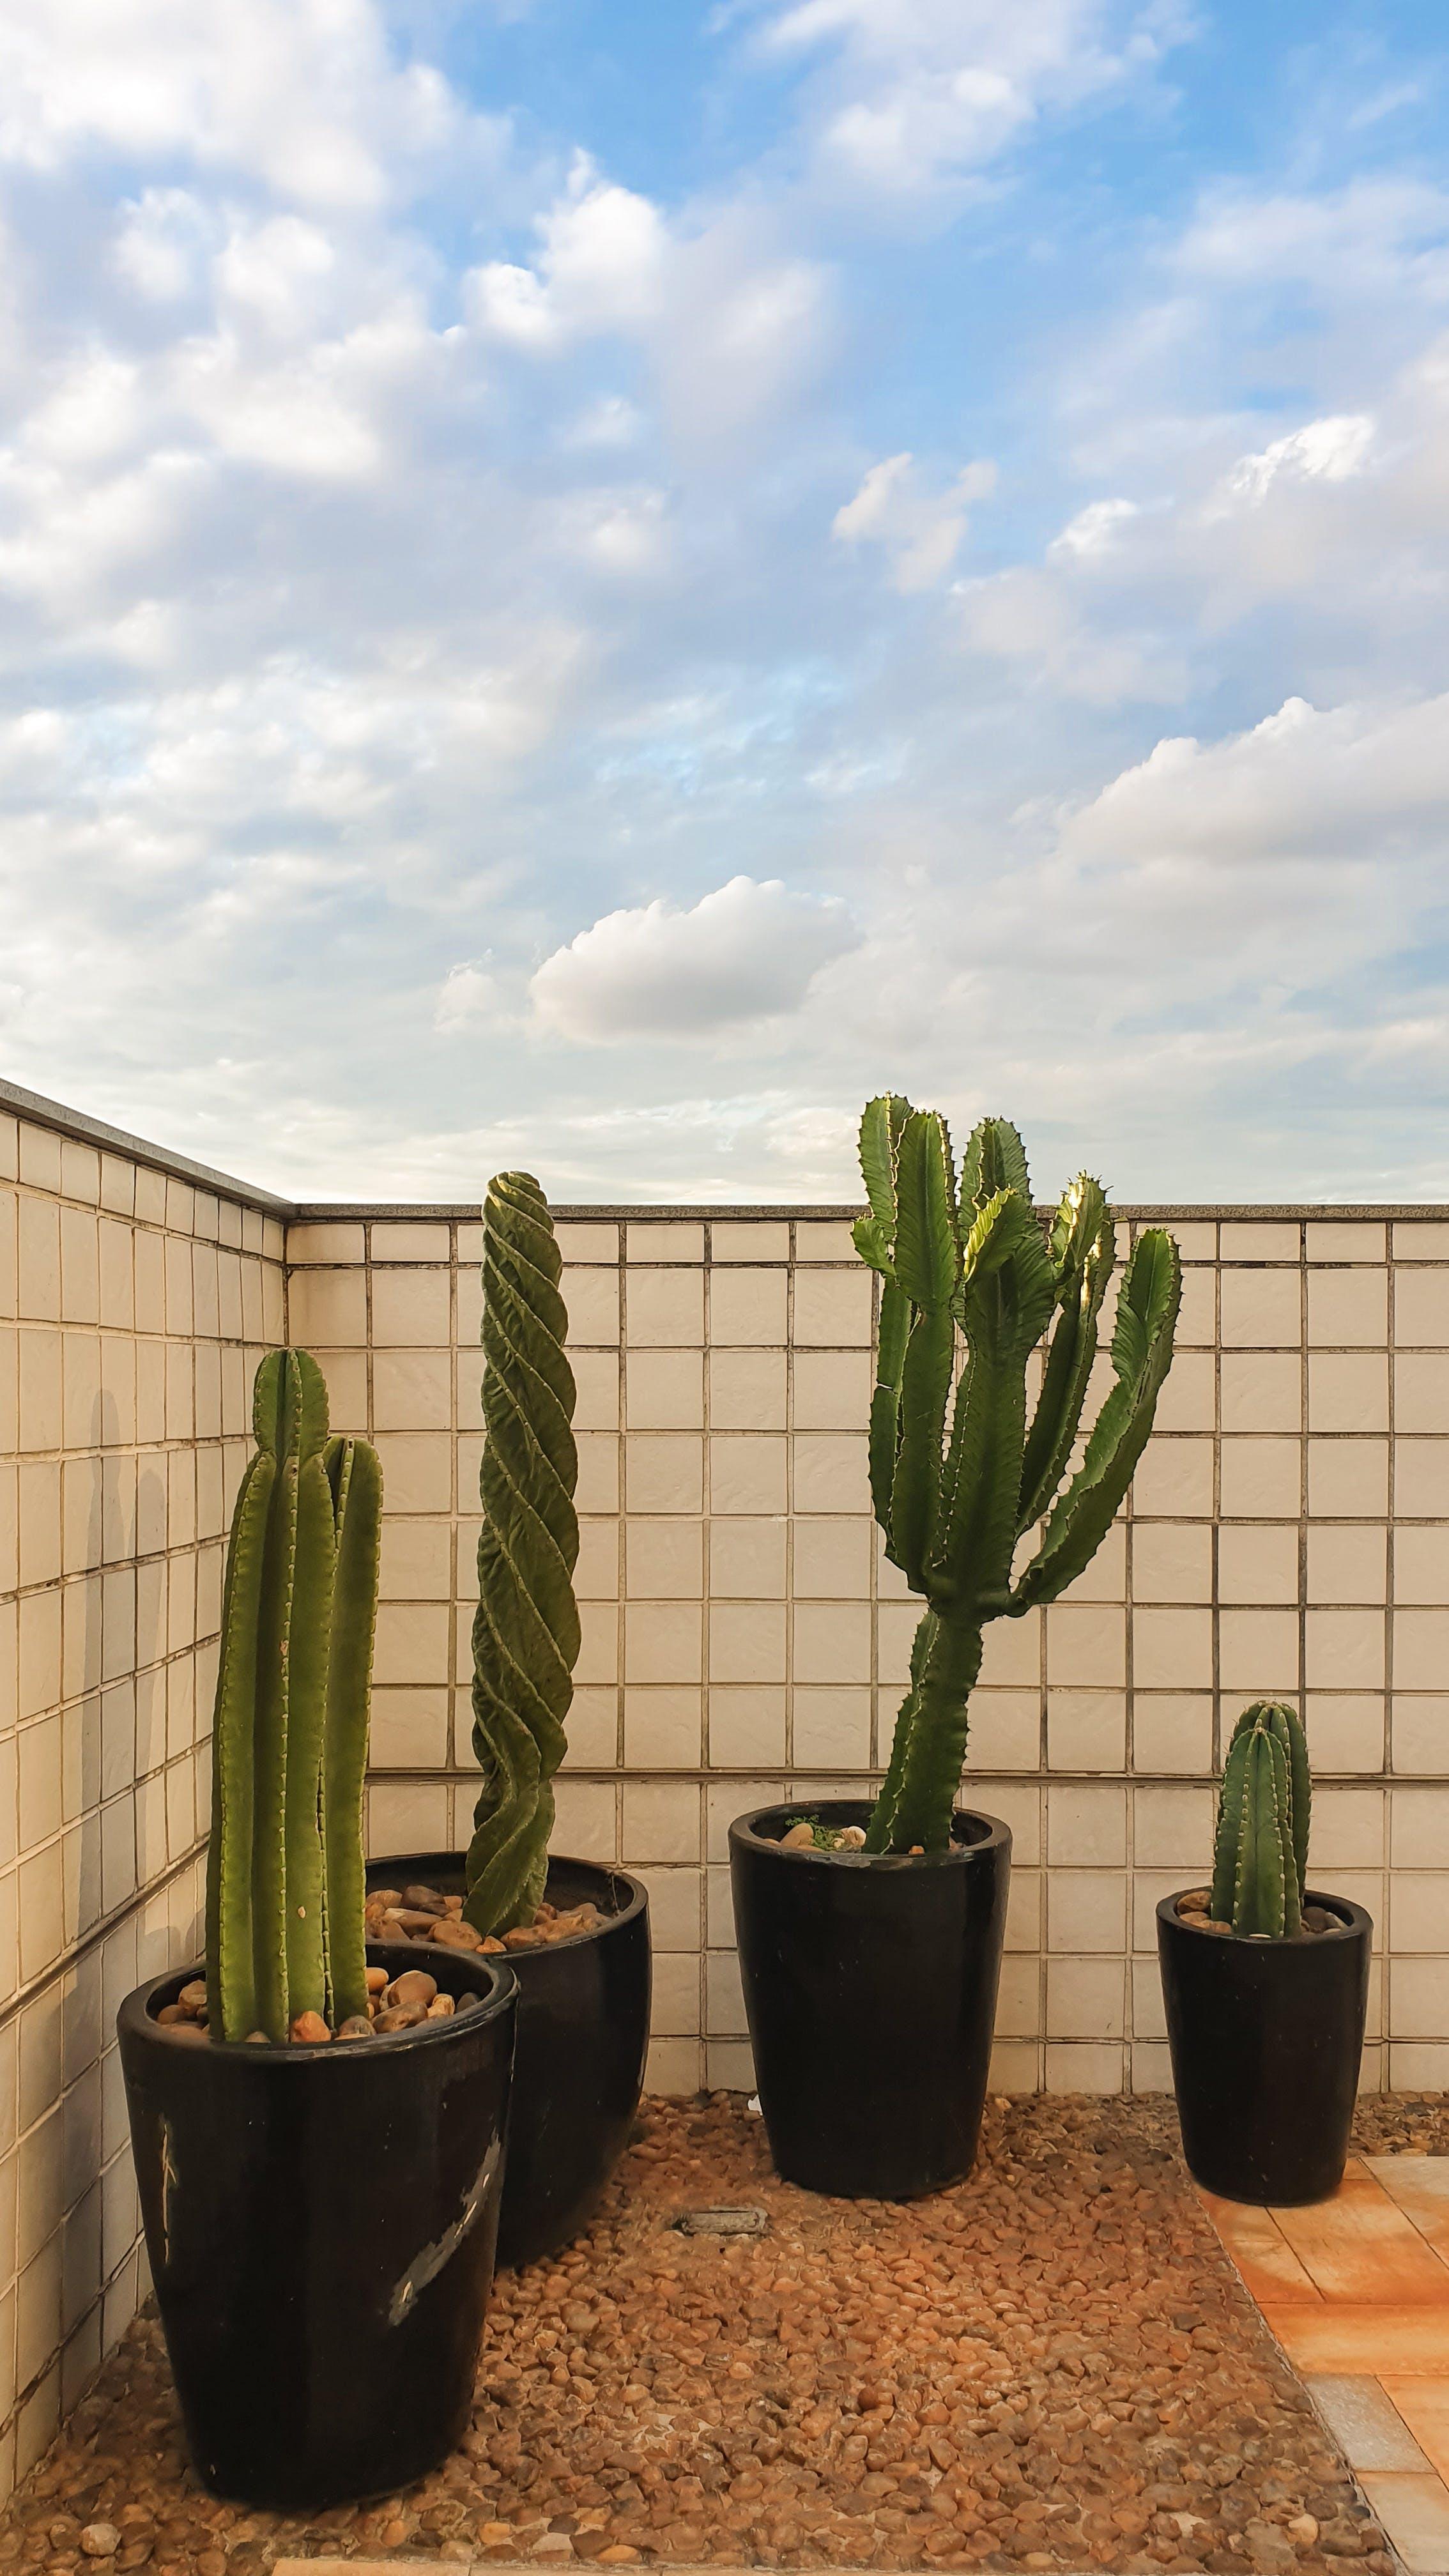 Four Green Cacti on Black Pot